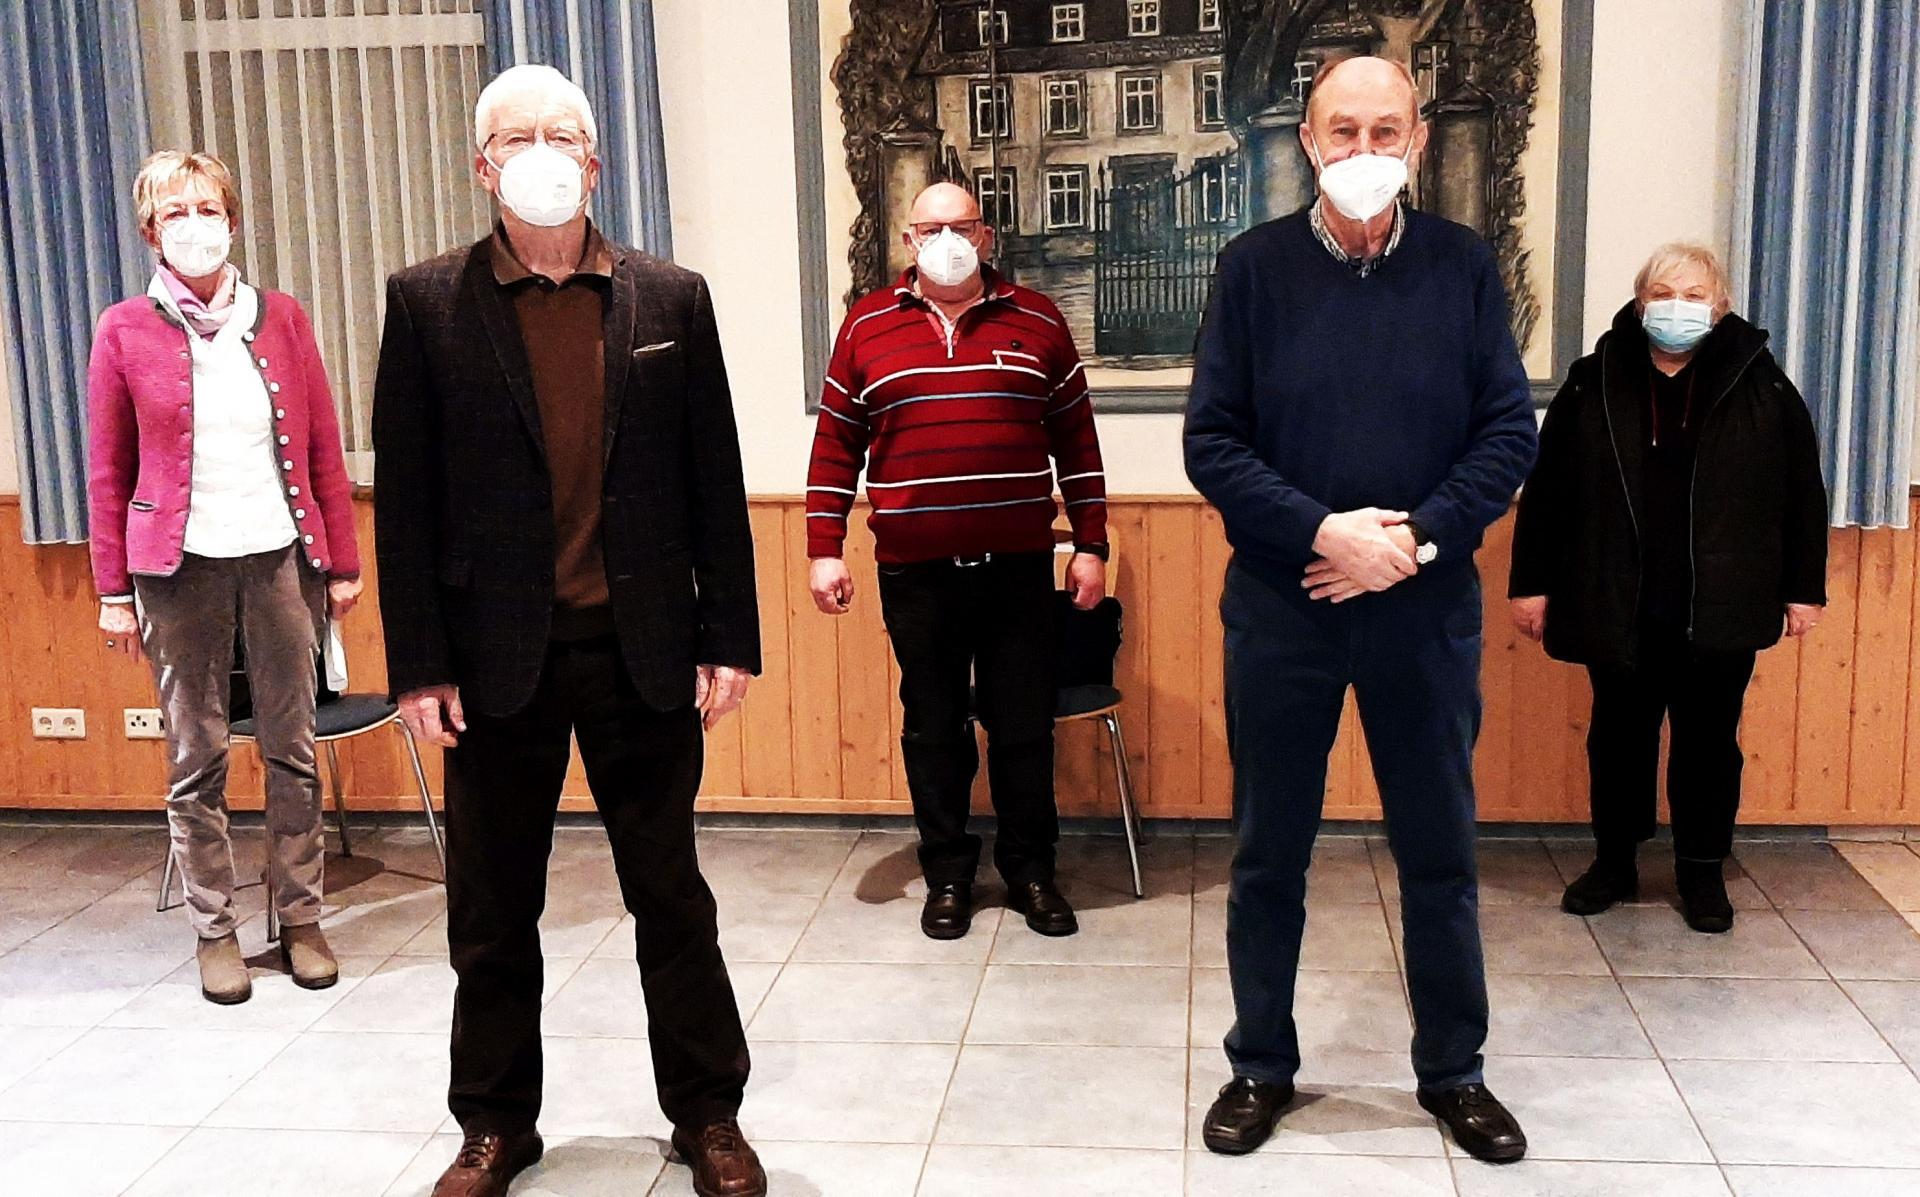 Vorstand 2021: E. Sievert, L. Mickisch, H-J Peters, Dr. U. Petersen, K. Woyke